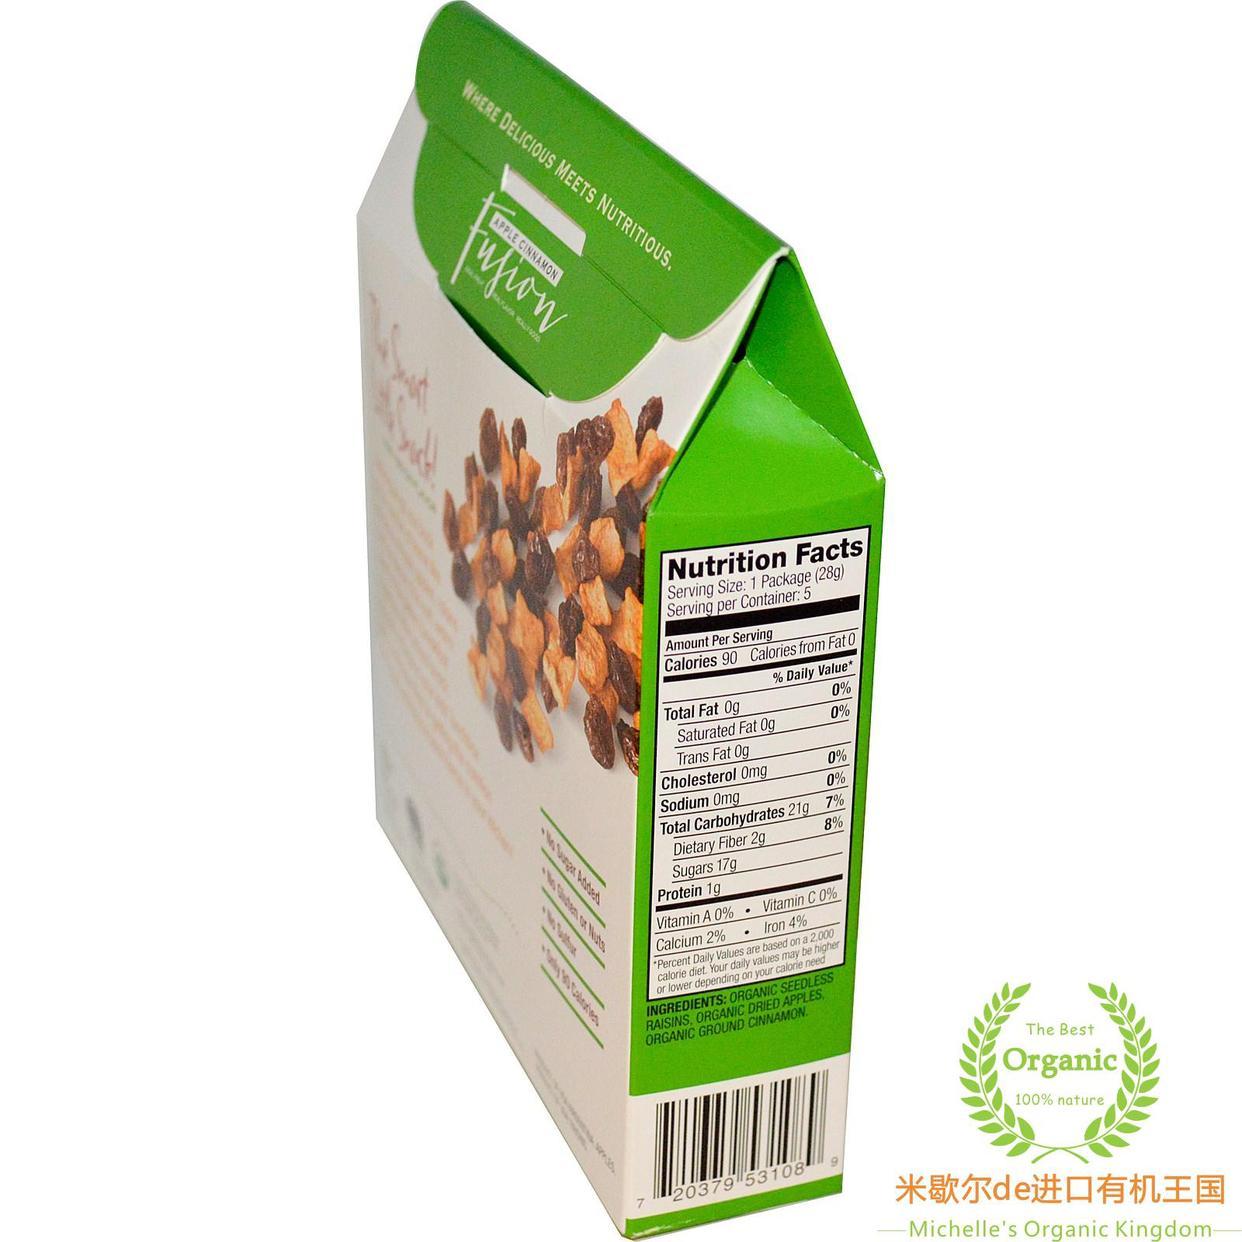 Made in Nature Organic Dried Fruit苹果葡萄干肉桂混合进口果干